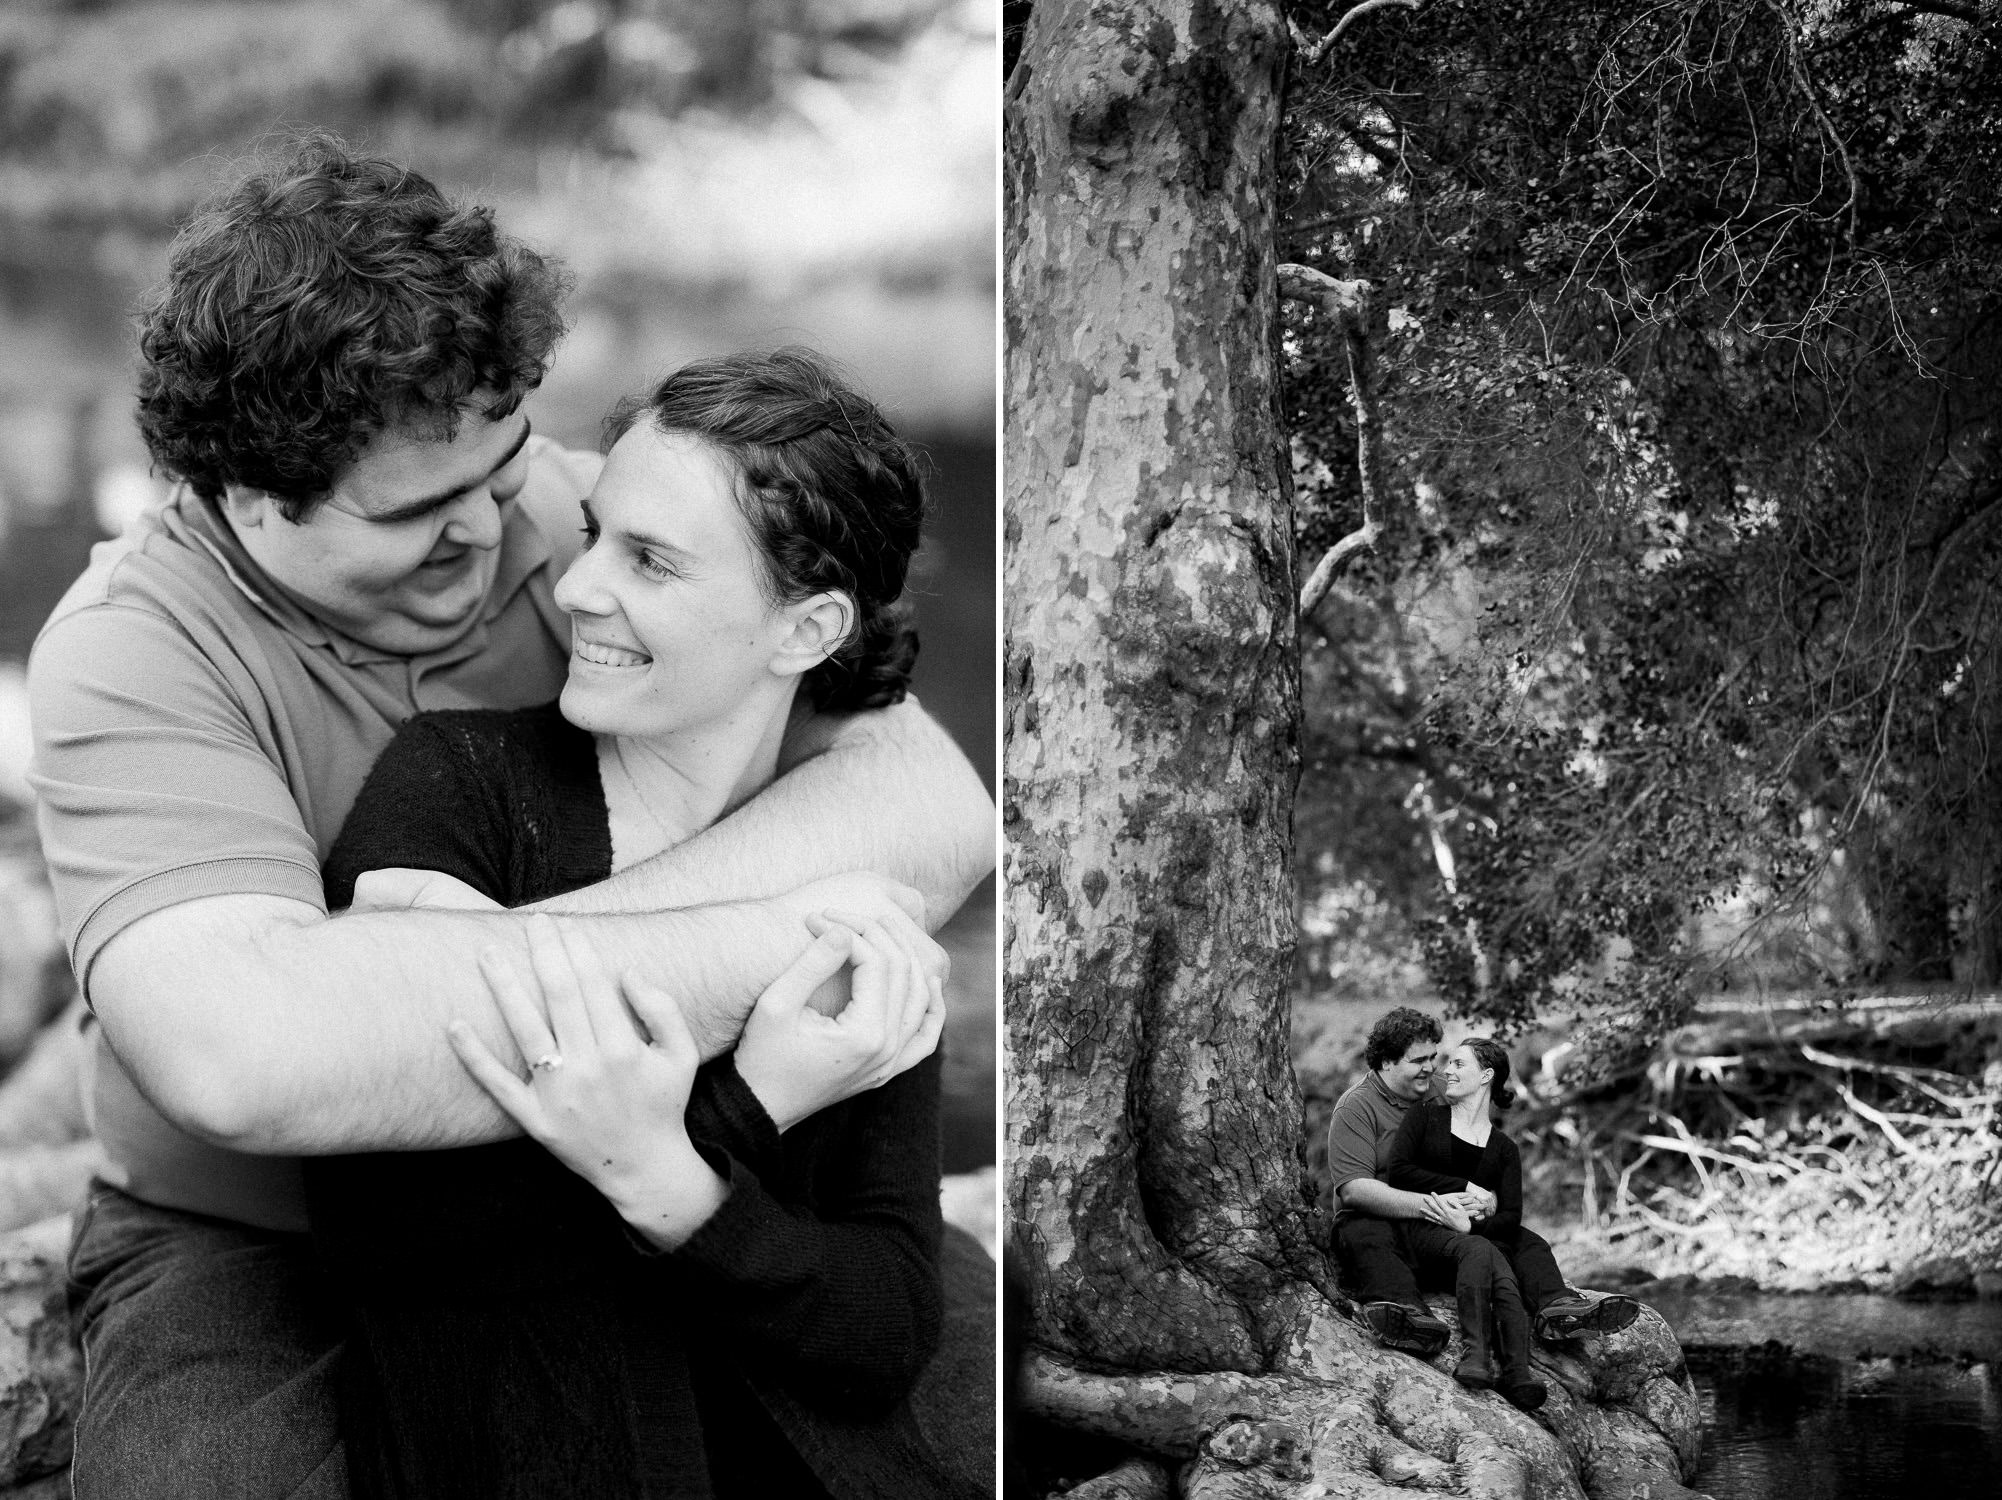 Chitactac Adams and Anderson Lake County Park Engagement 016.jpg